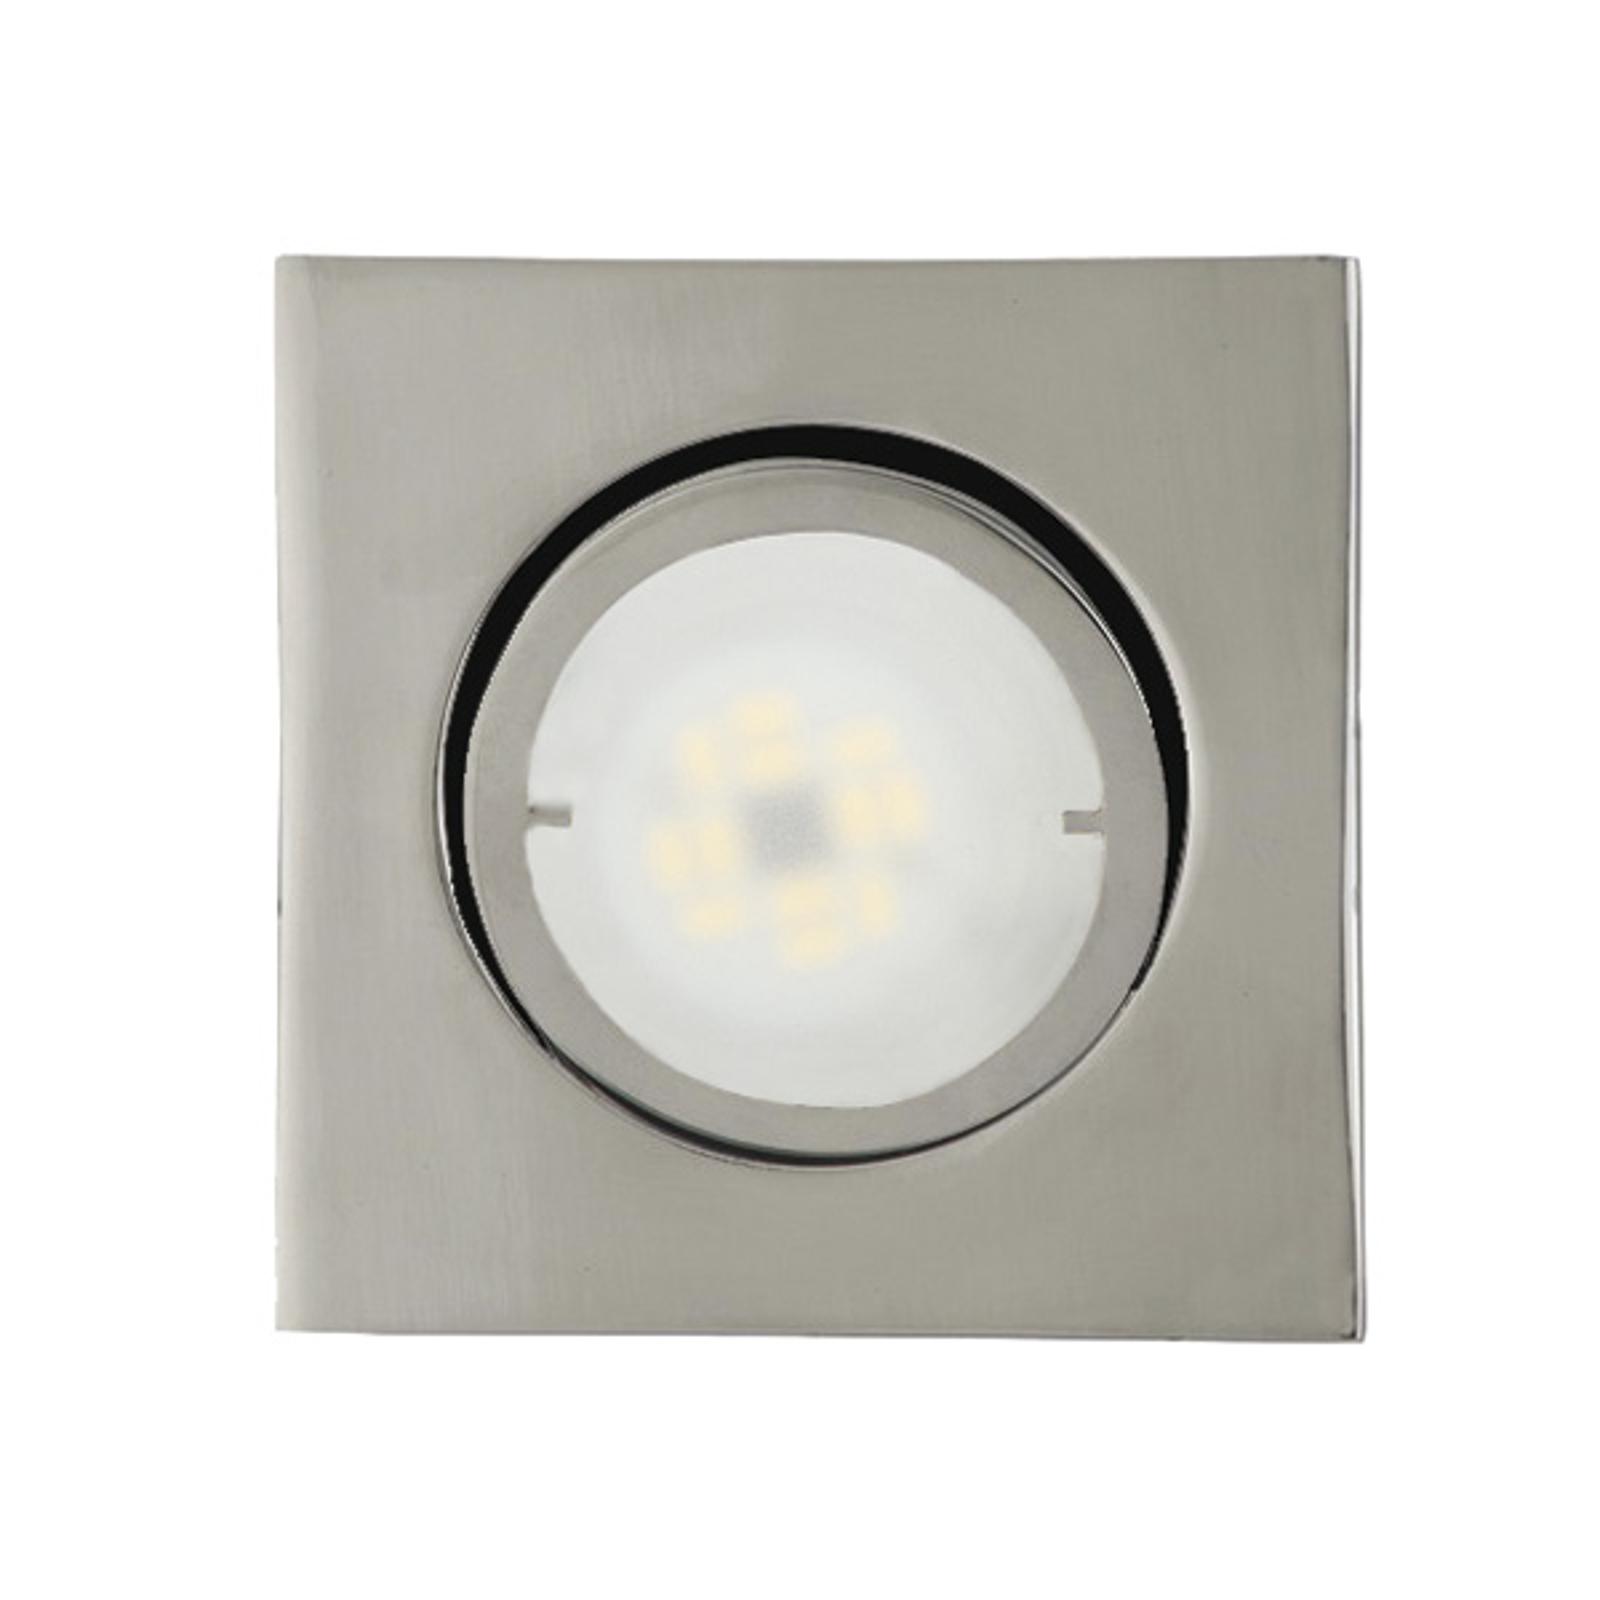 Spot LED incasso Joanie, angolare, cromo